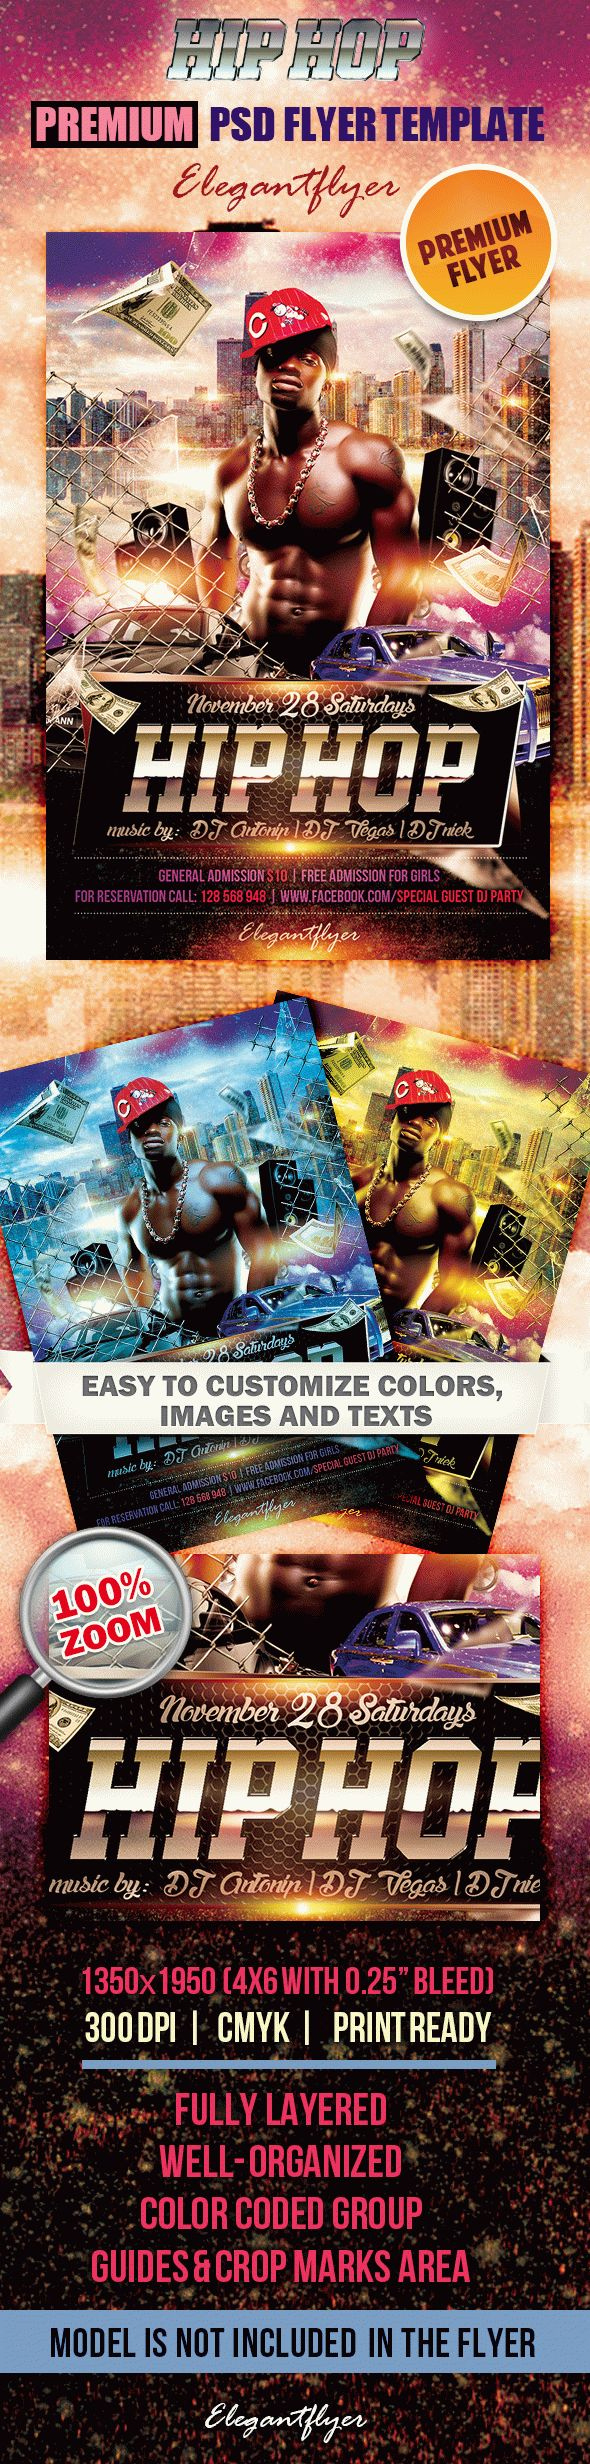 Hiphop  Premium Club Flyer Psd Template Elegantflyer regarding Printable Hip Hop Certificate Template 6 Explosive Ideas